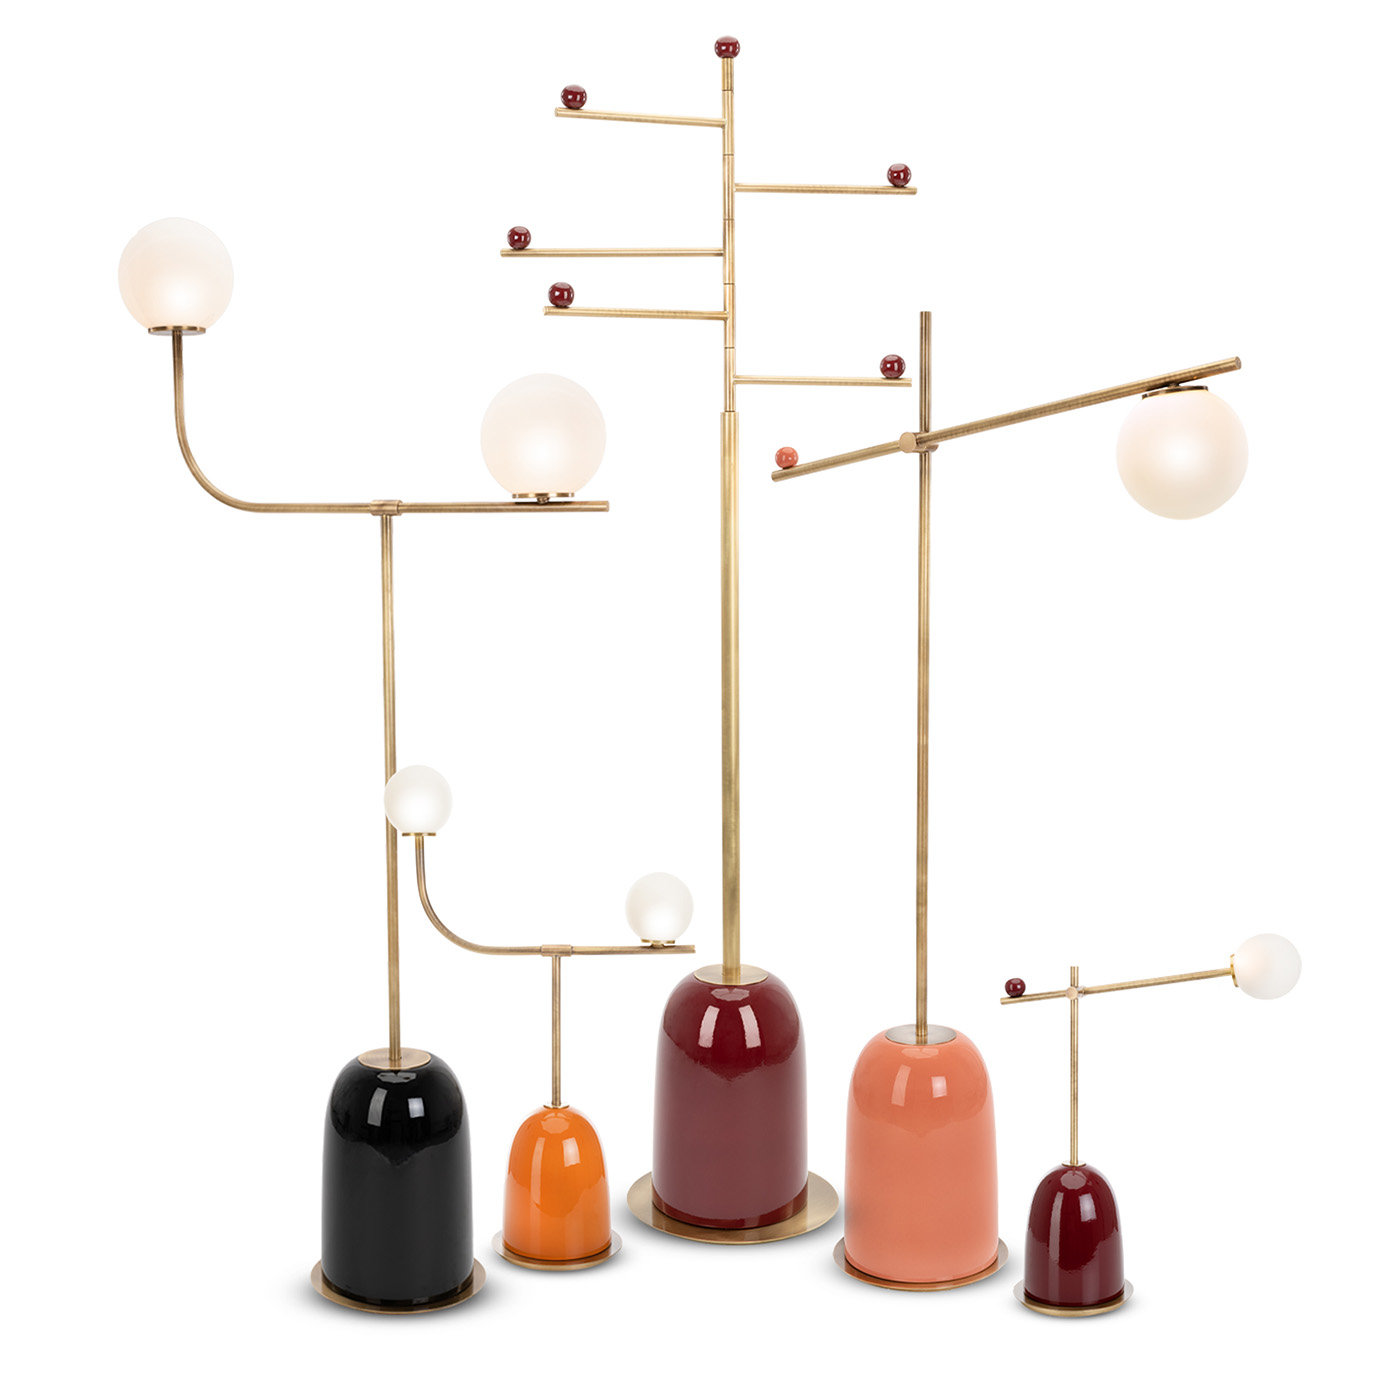 MARIONI/マリオーニ/PINS ARCHEDテーブルライト